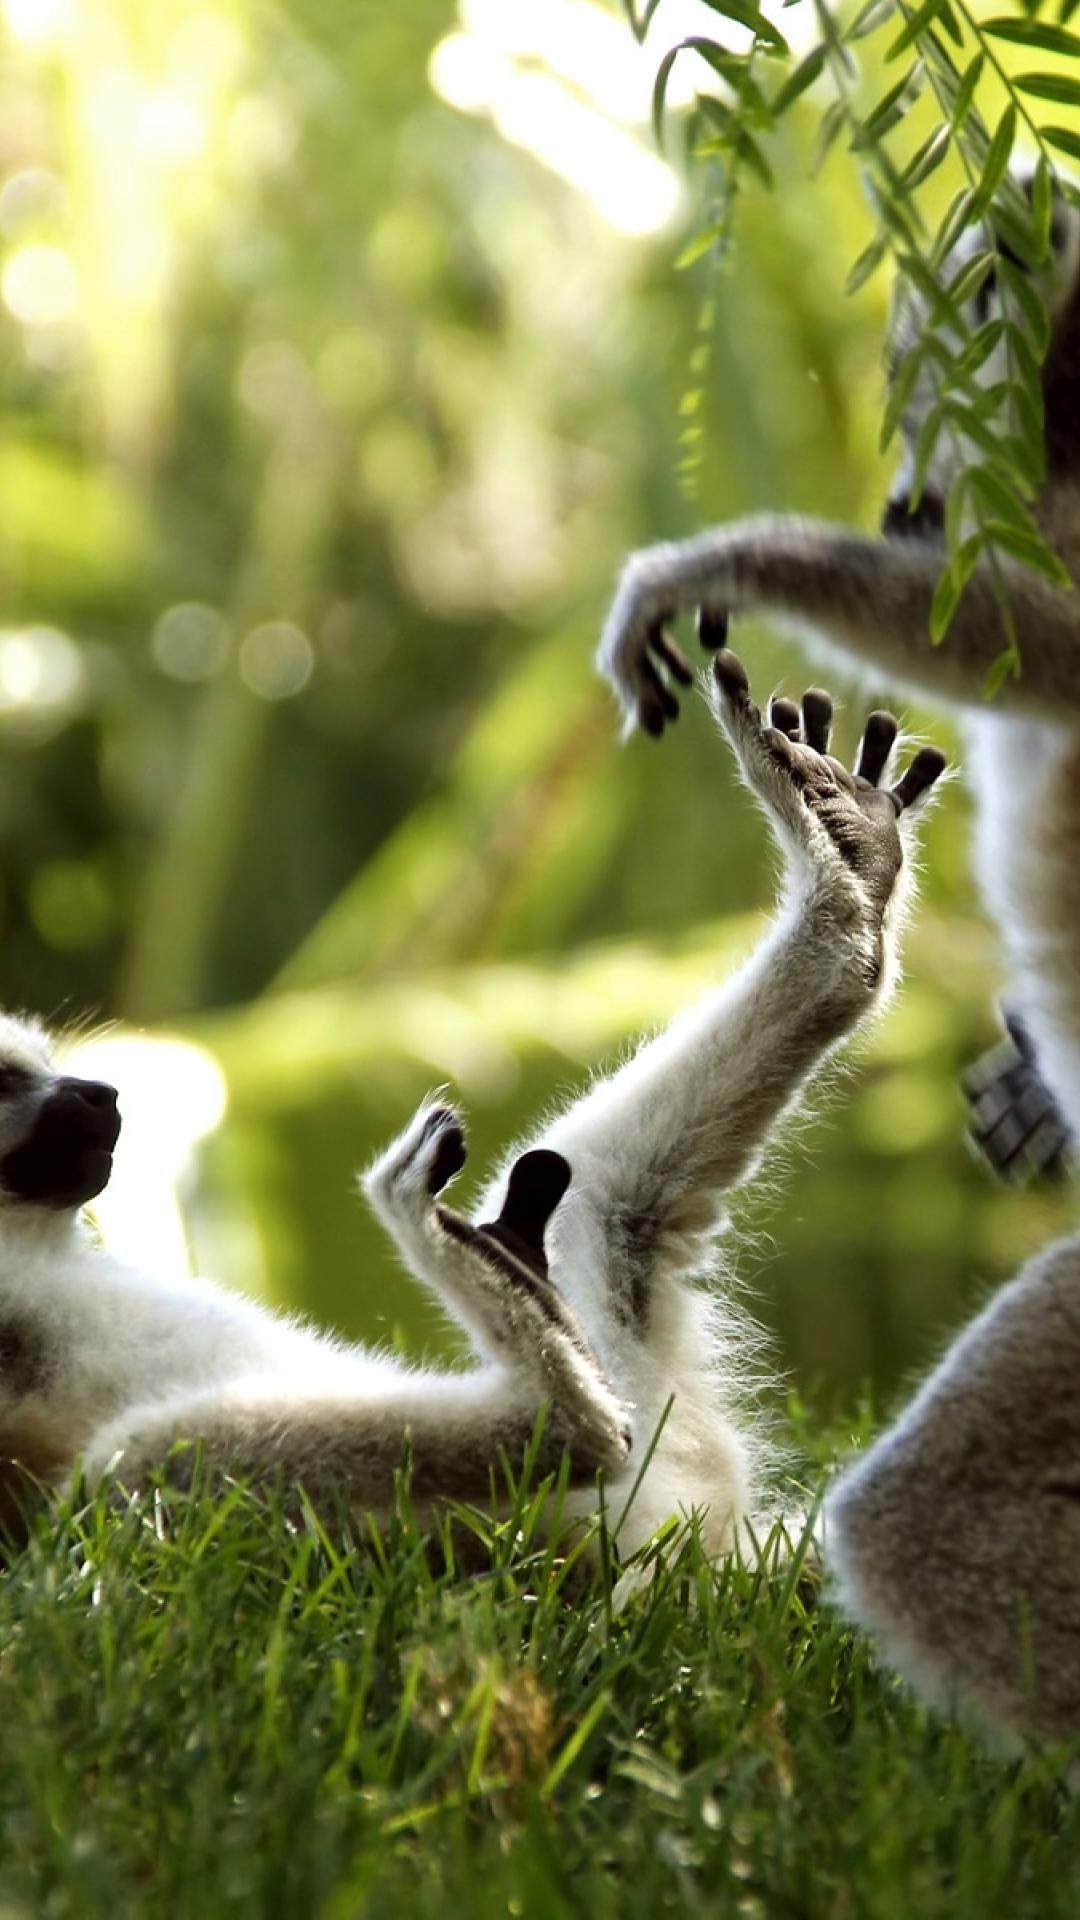 The Wallpaper Of Lemur